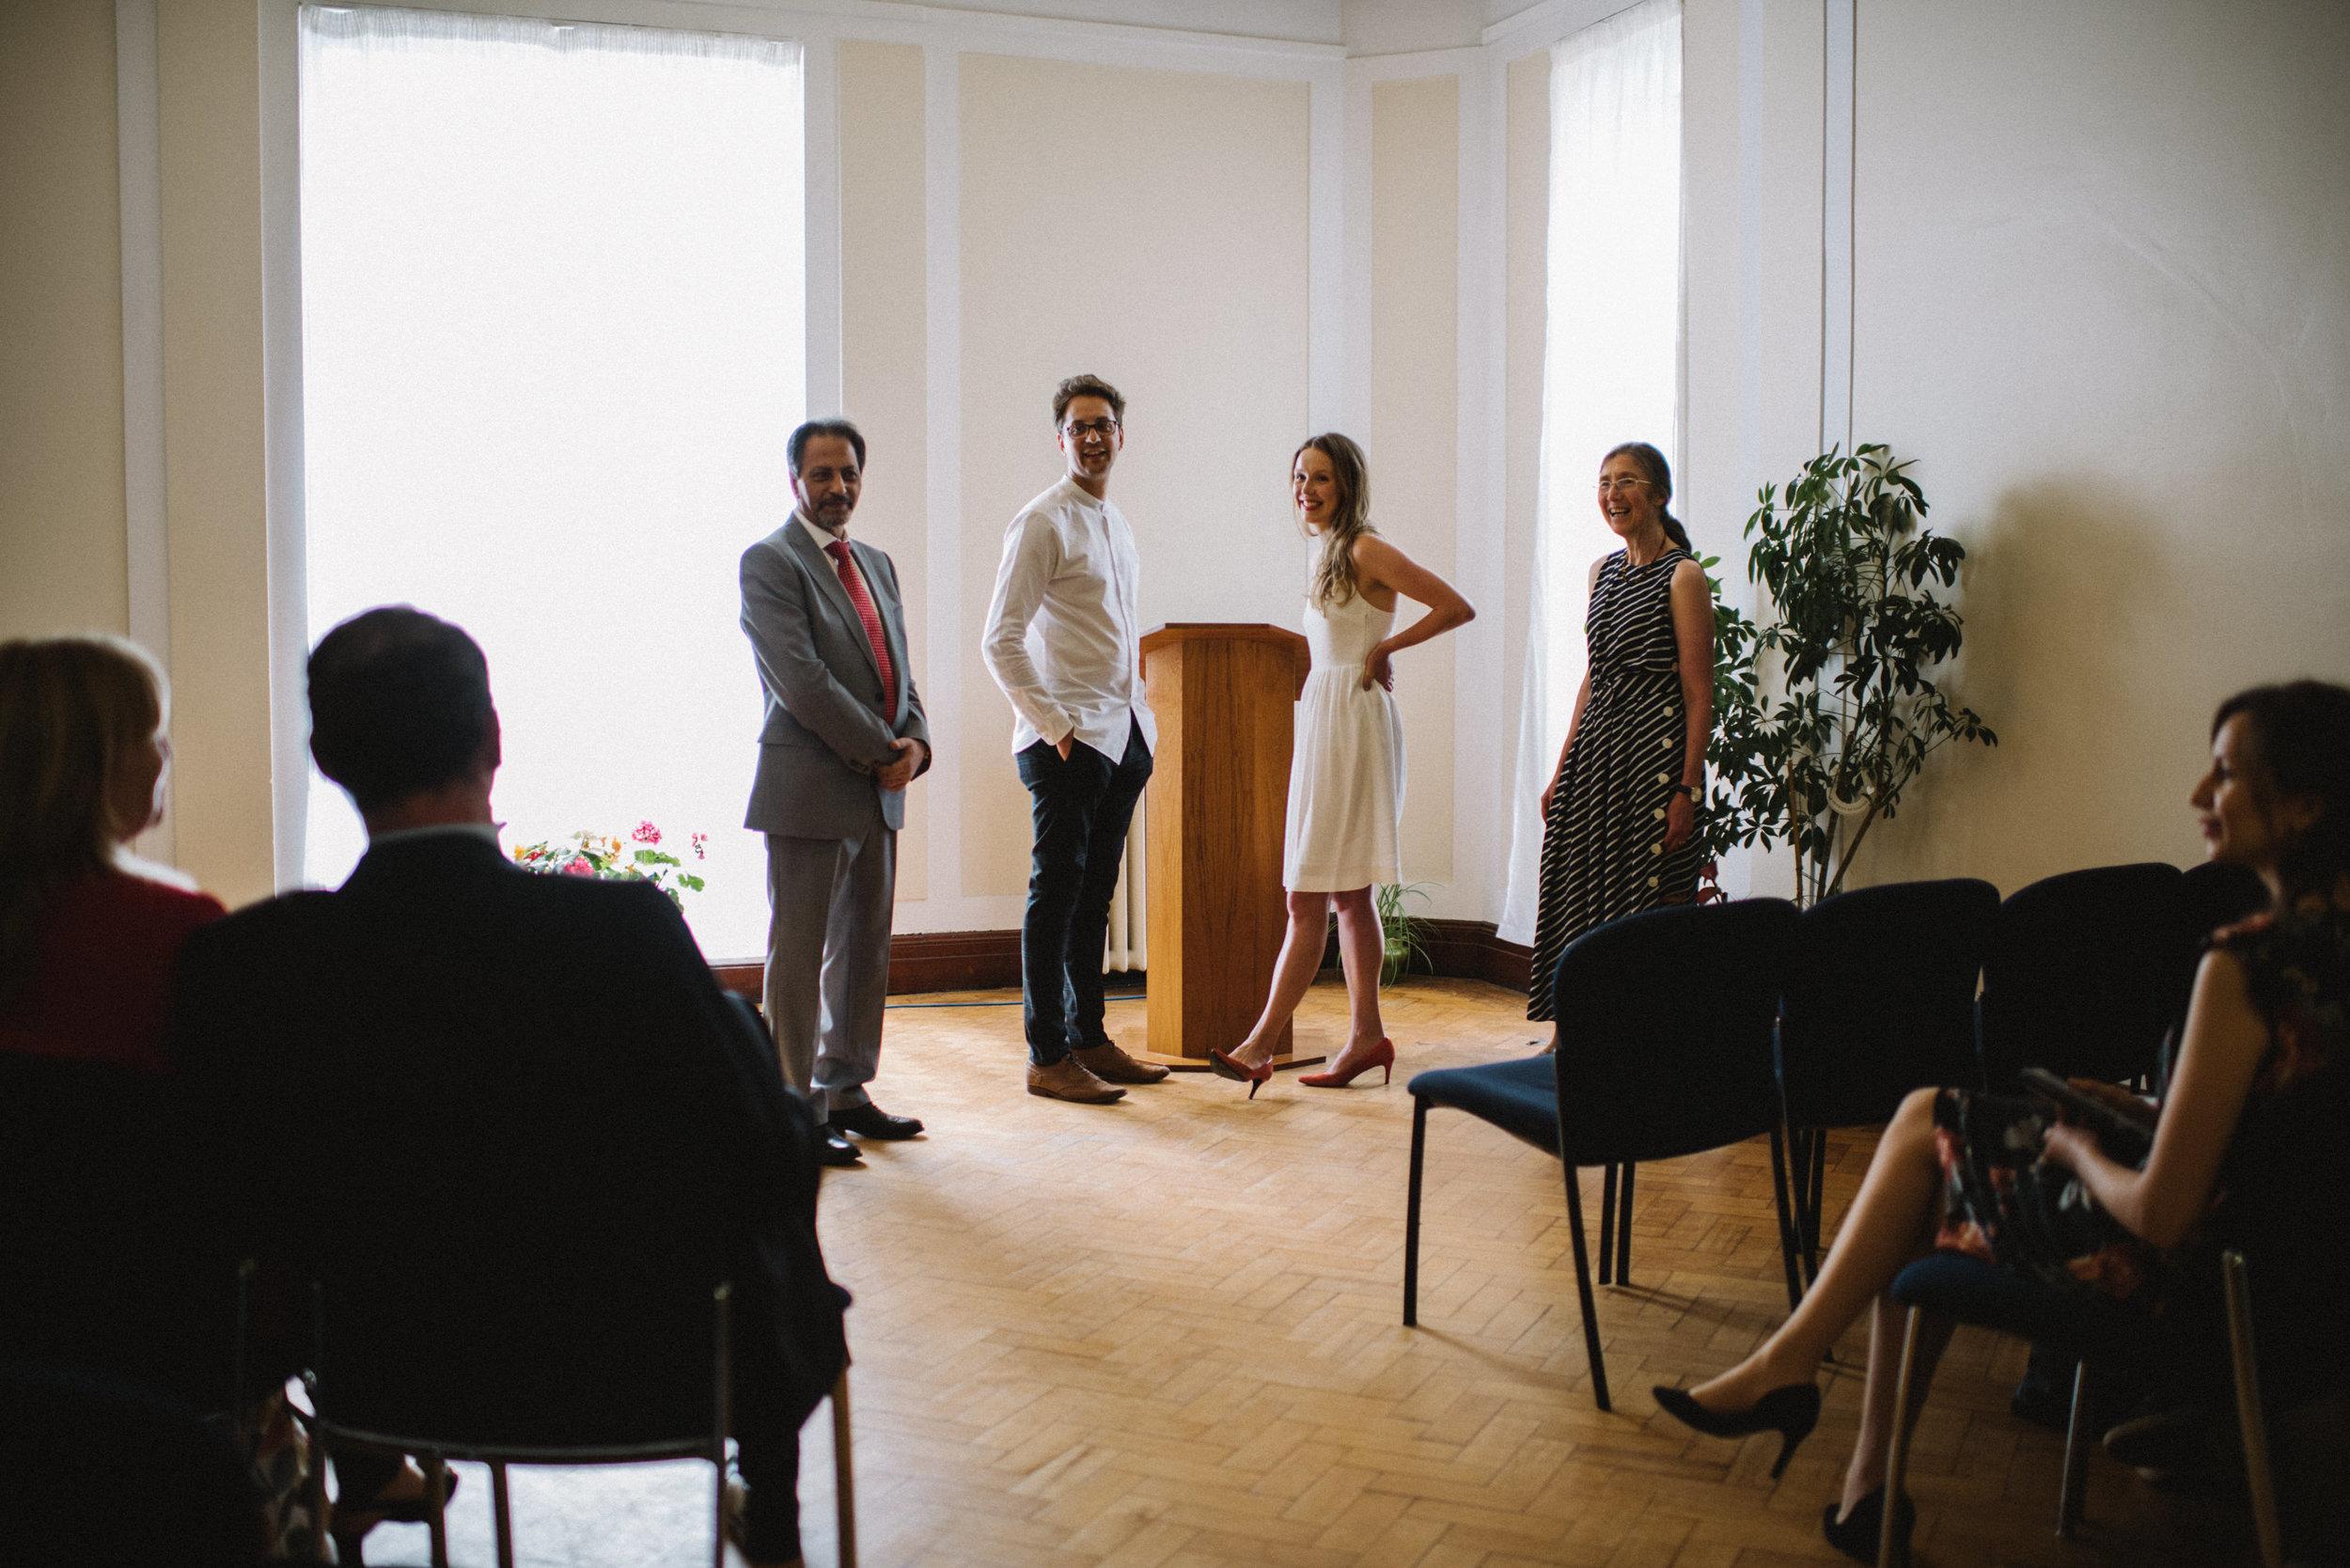 0107-LISA-DEVINE-PHOTOGRAPHY-ALTERNATIVE-WEDDING-PHOTOGRAPHY-SCOTLAND-DESTINATION-WEDDINGS-GLASGOW-WEDDINGS-COOL-WEDDINGS-STYLISH-WEDDINGS.JPG